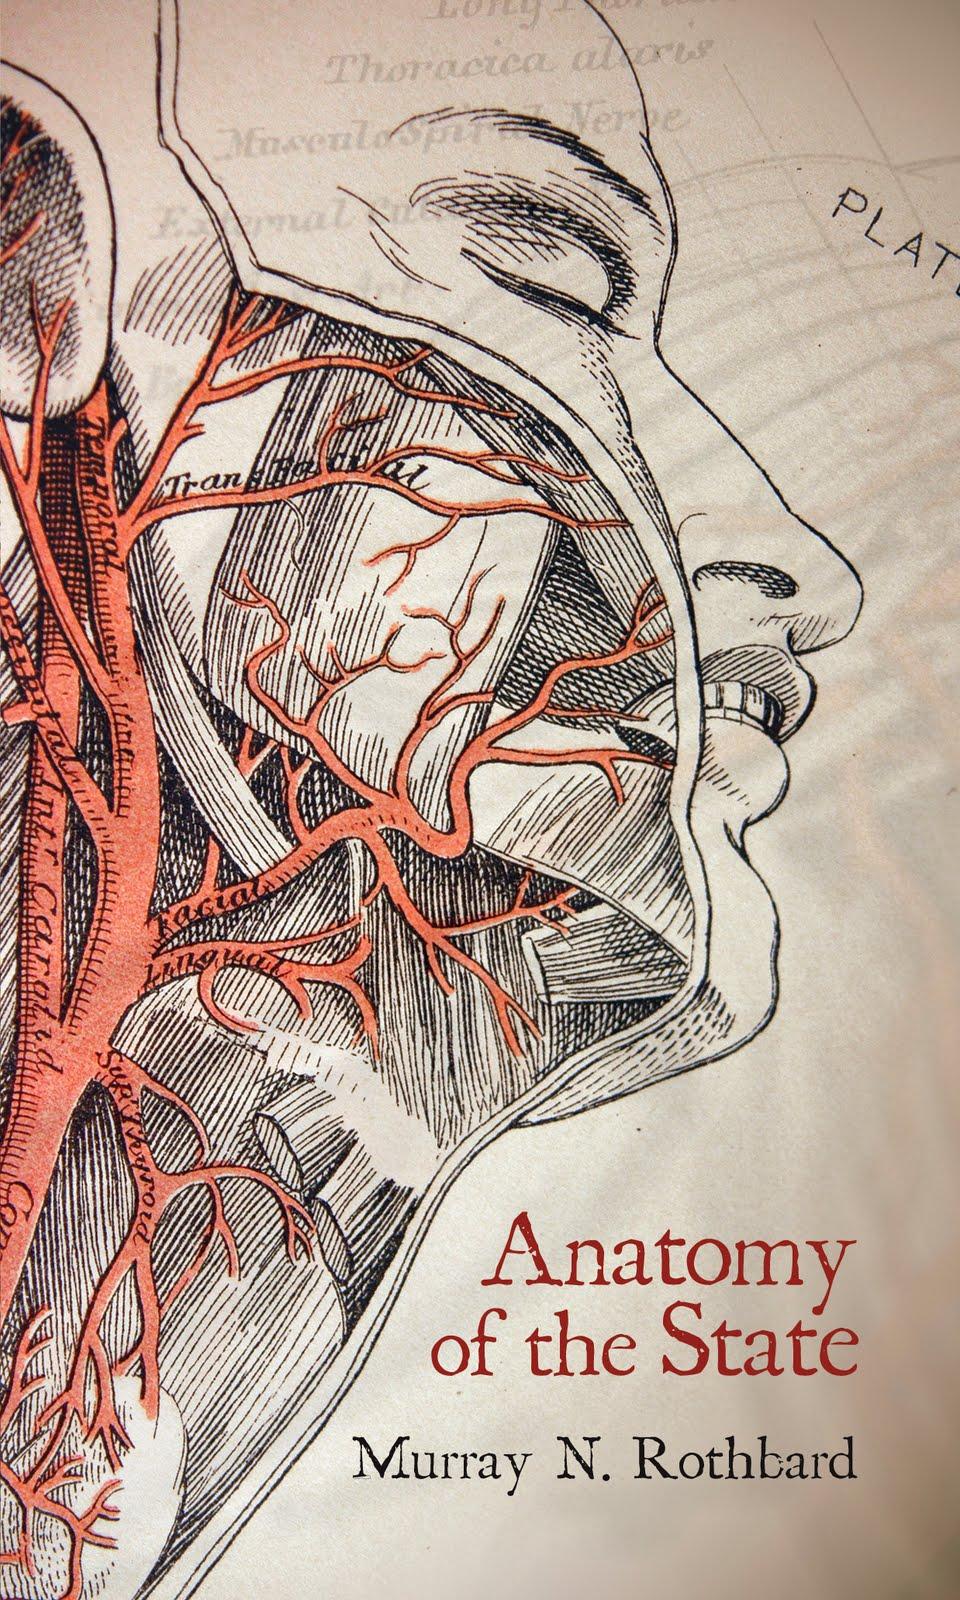 Anatomy of the State | by Murray N. Rothbard (book)